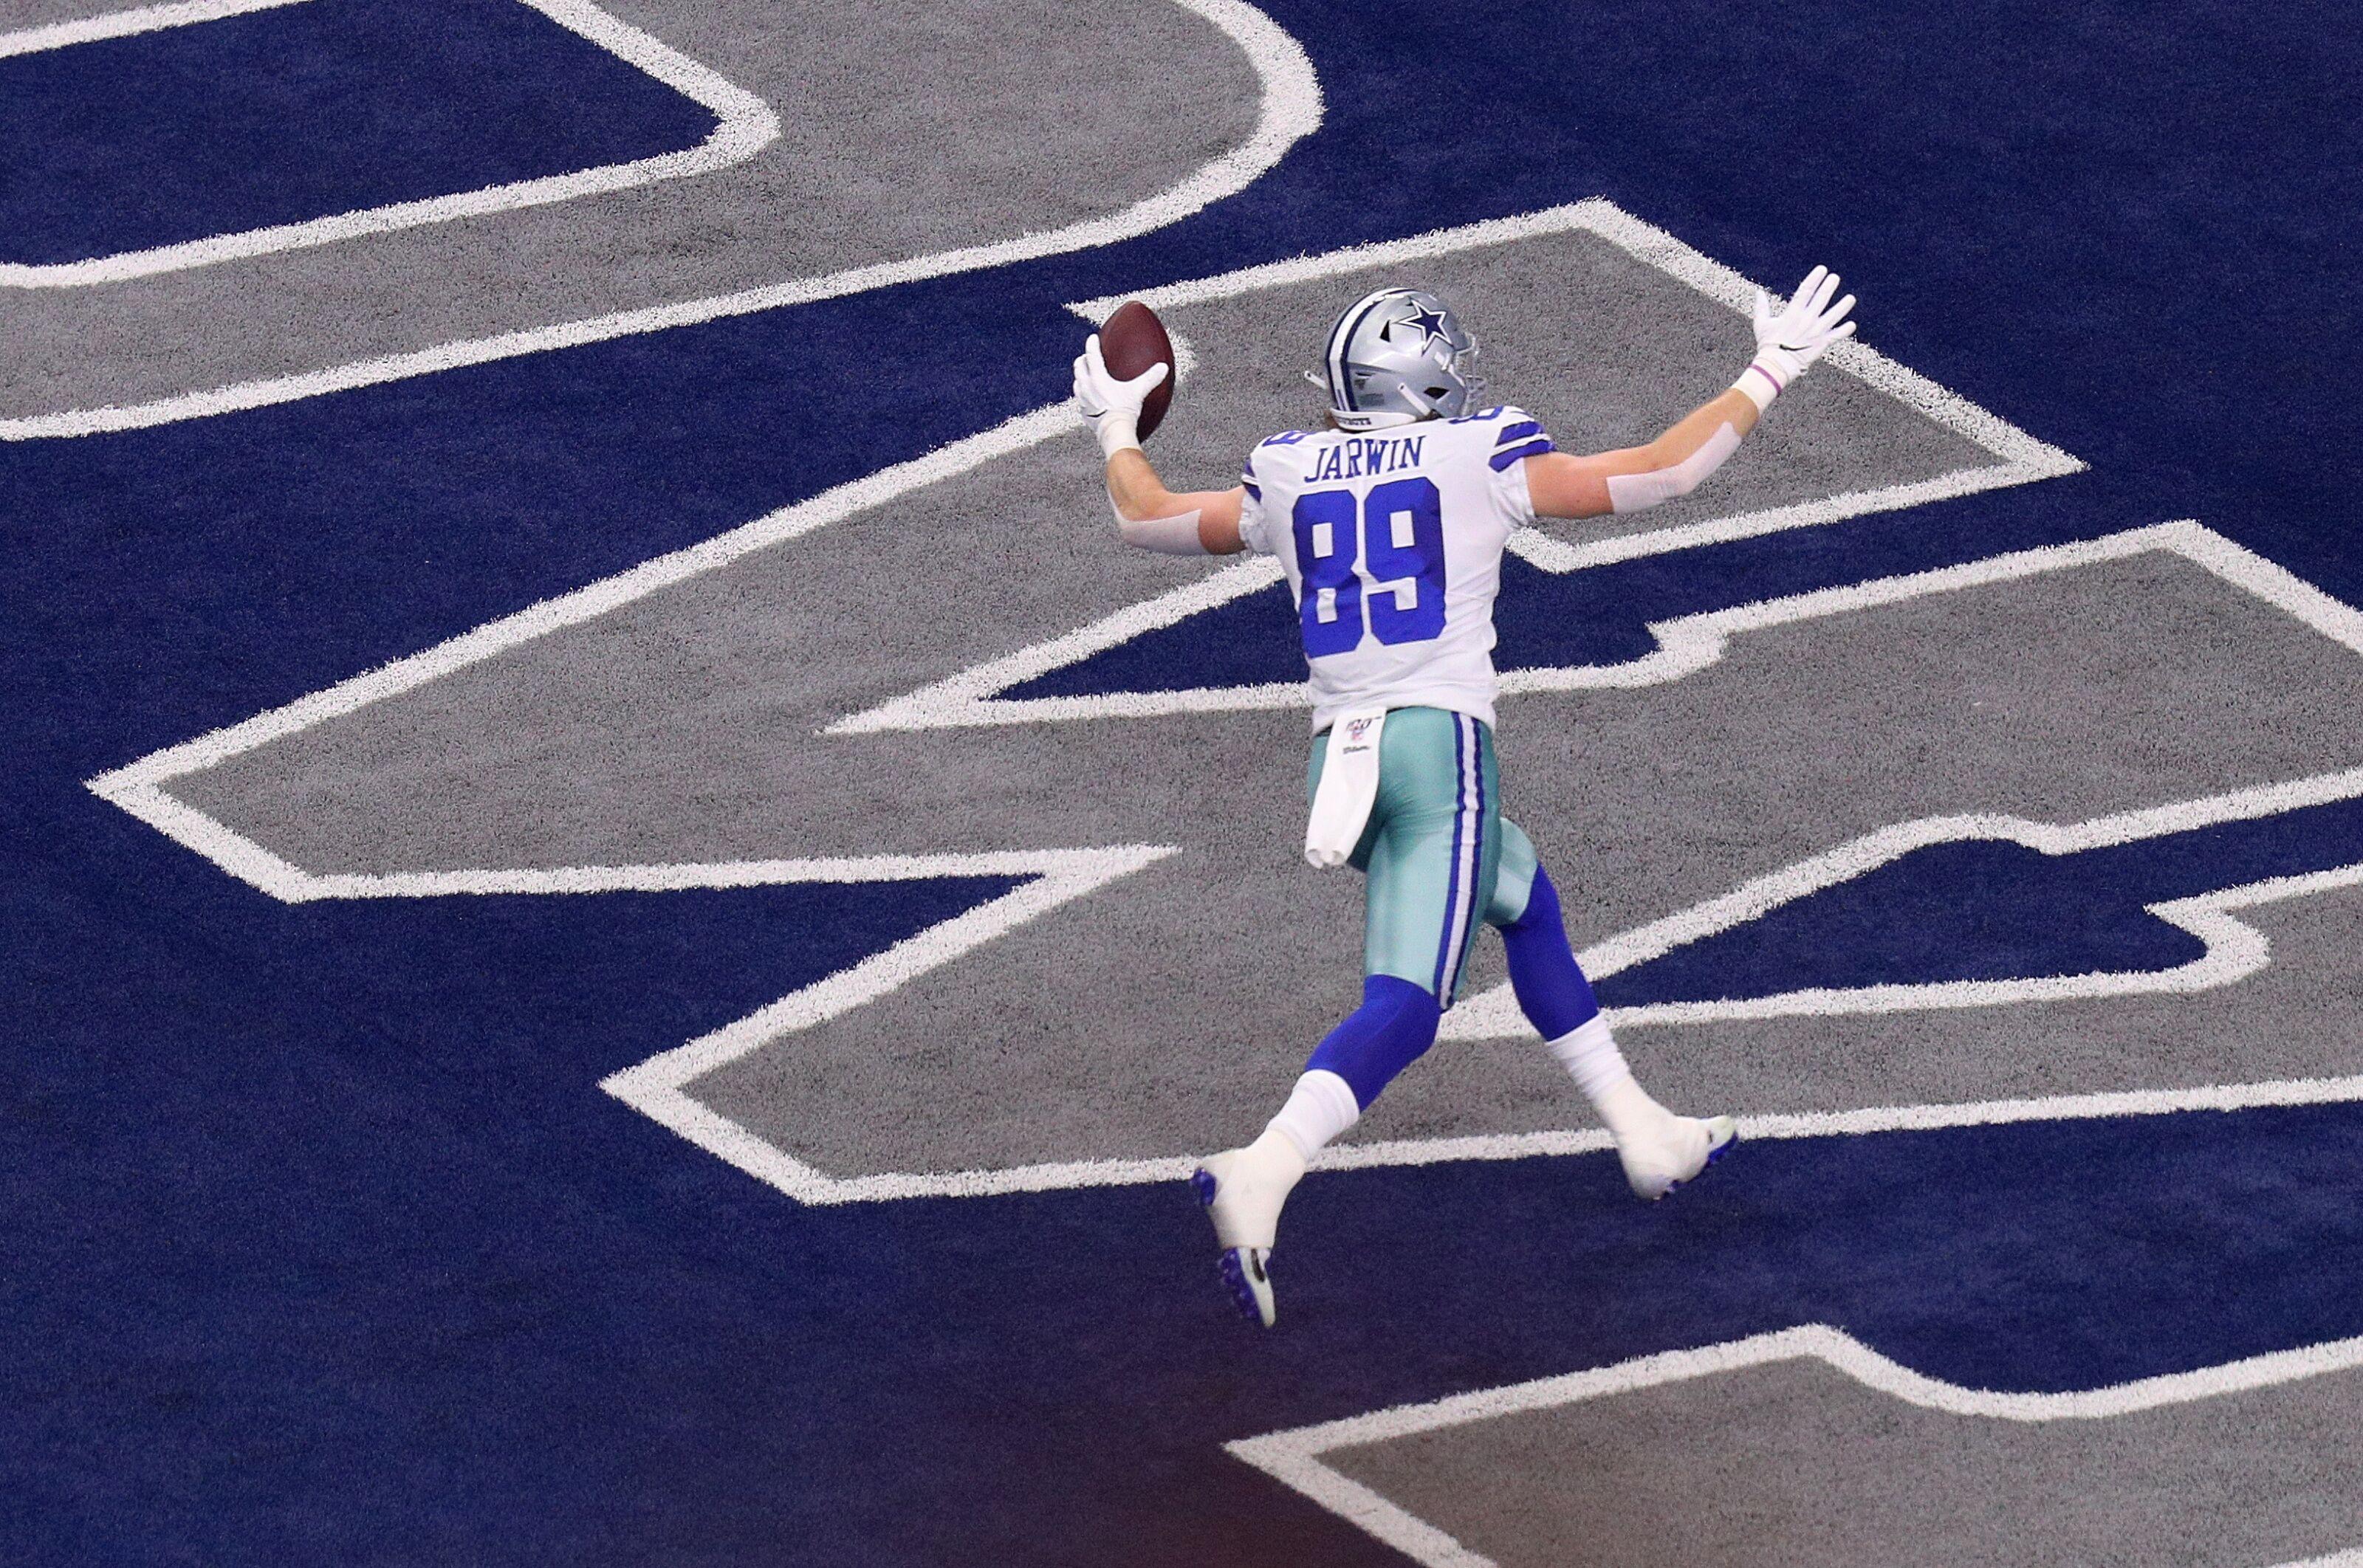 Dallas Cowboys: Should Blake Jarwin start over Jason Witten?